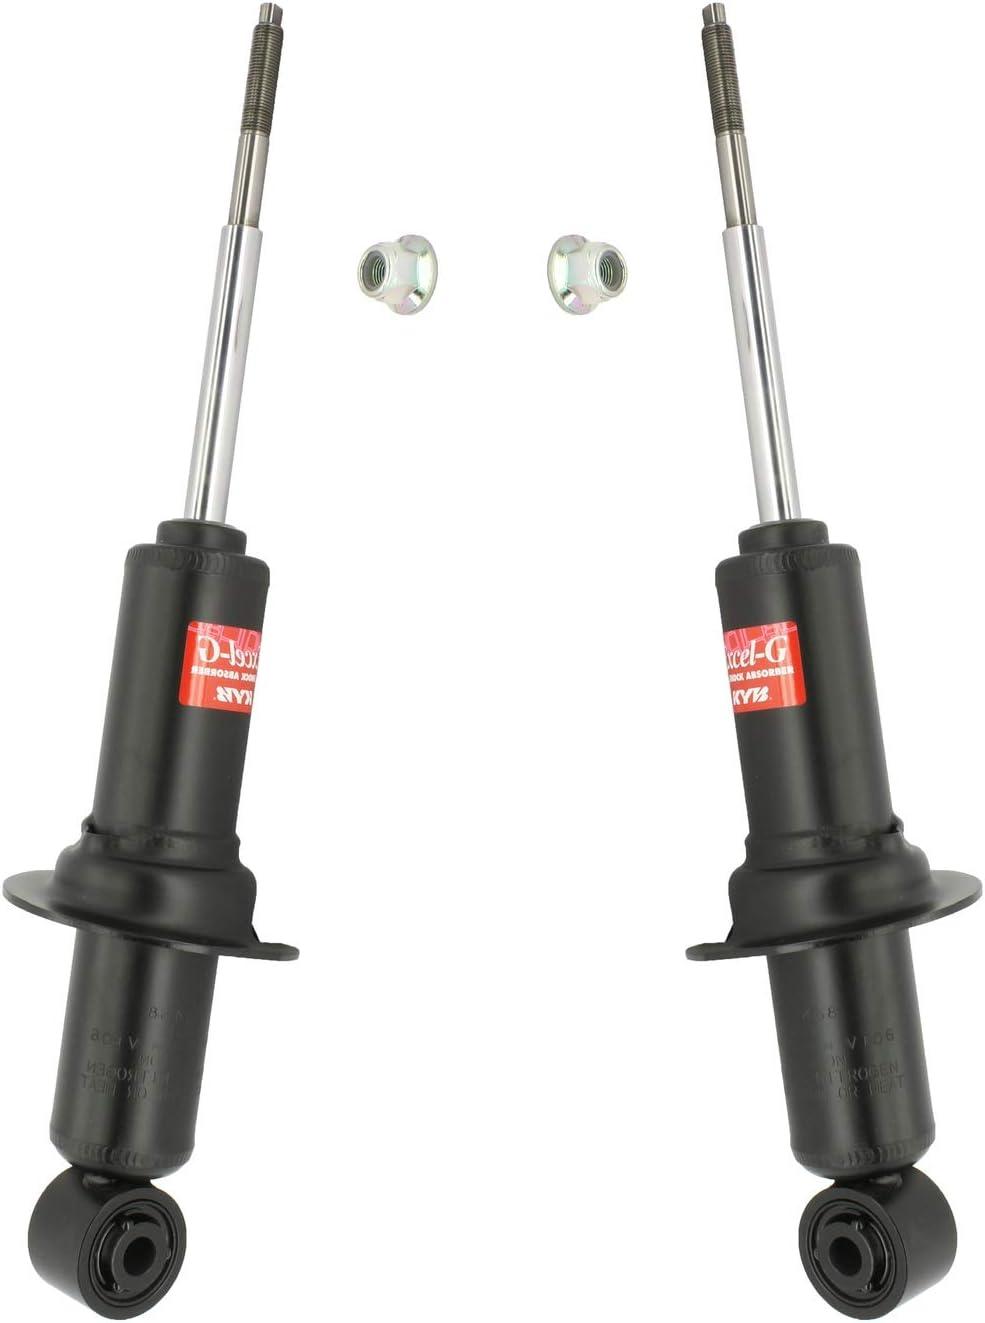 Pair Set of 2 Front KYB Excel-G Suspension Struts For Nissan Pathfinder 2005-2012 Xterra 2005-2015